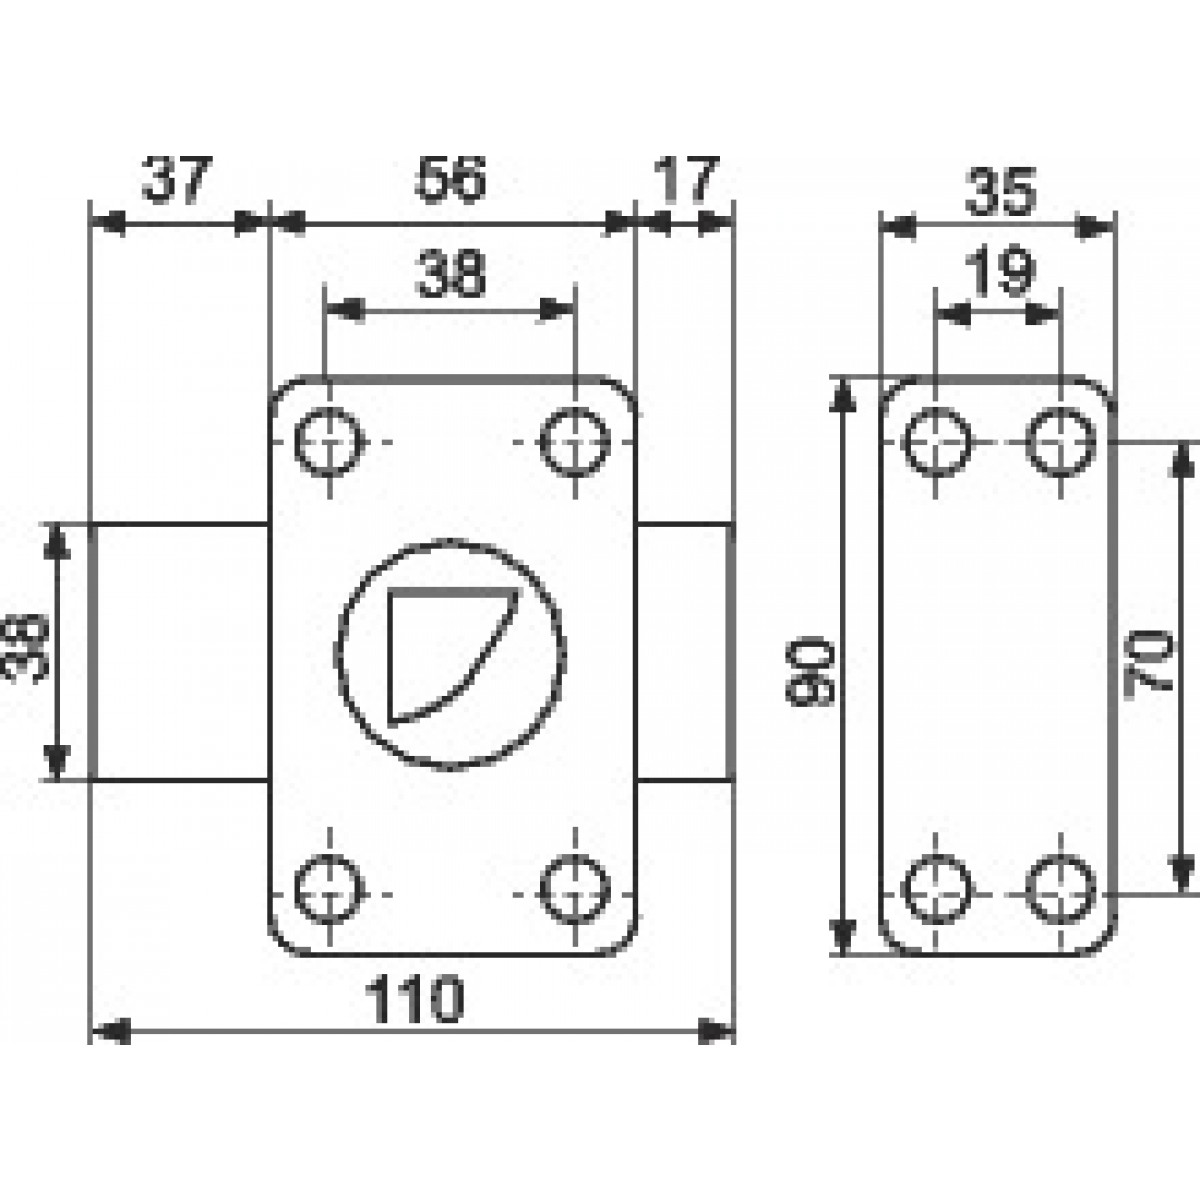 Verrou à bouton bronze - Cylindre 45 mm - Pêne 110 mm - City 25 - ISÉO